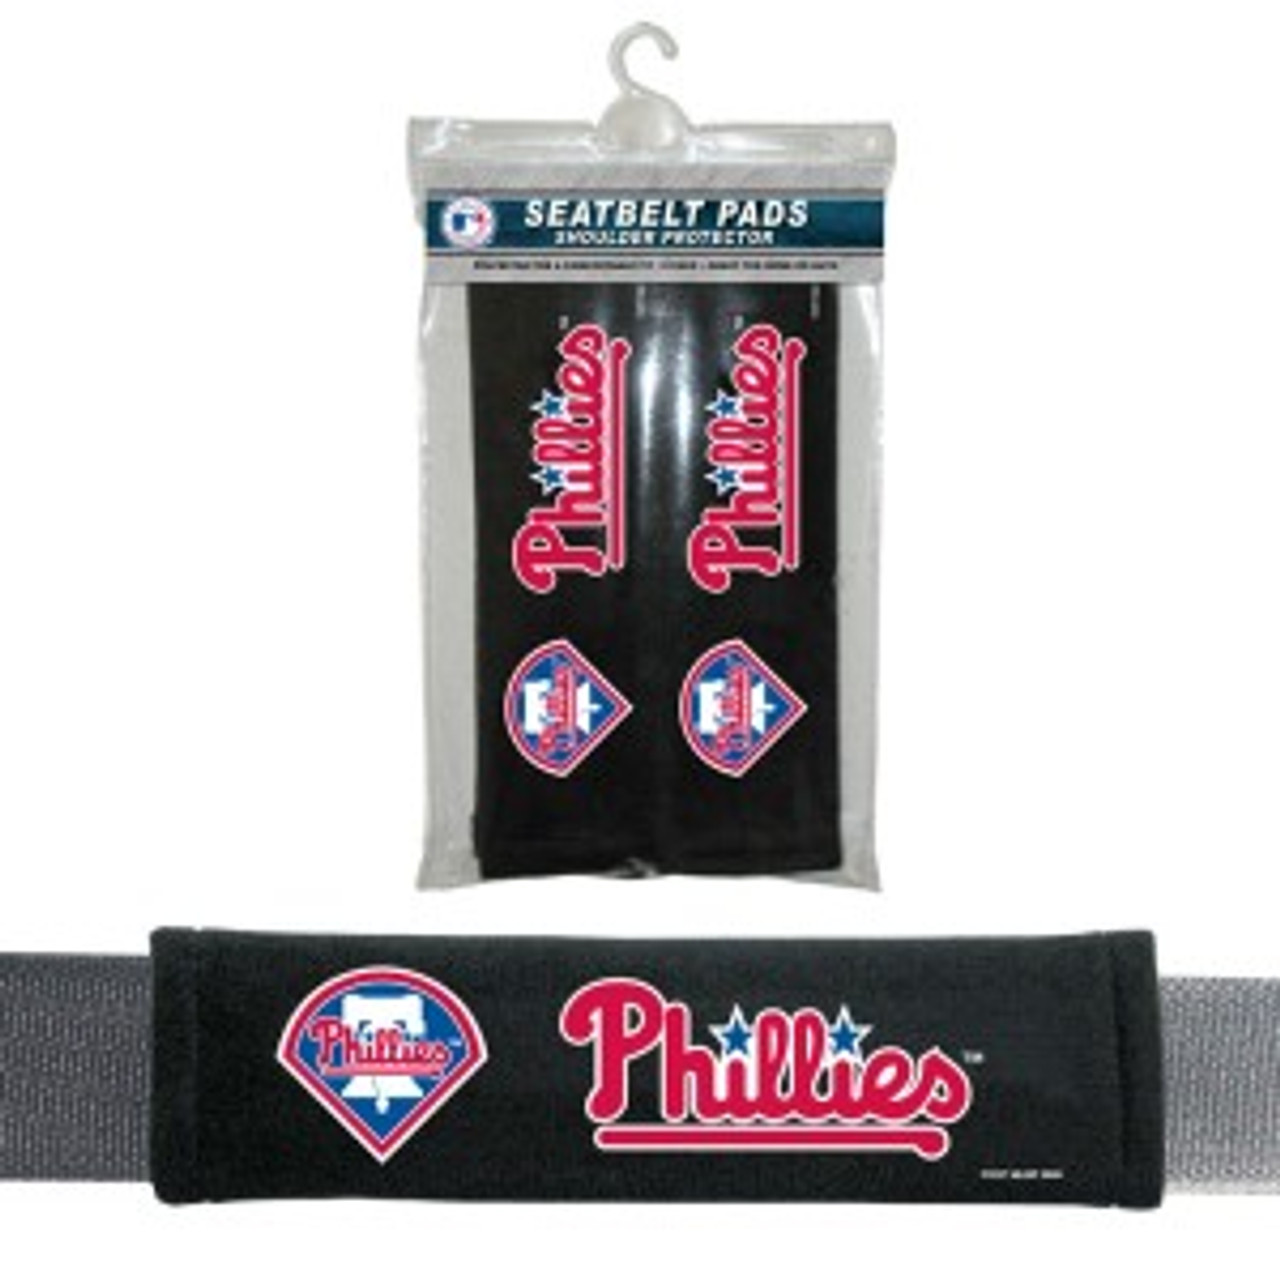 Philadelphia Phillies Velour Seat Belt Pads - Special Order